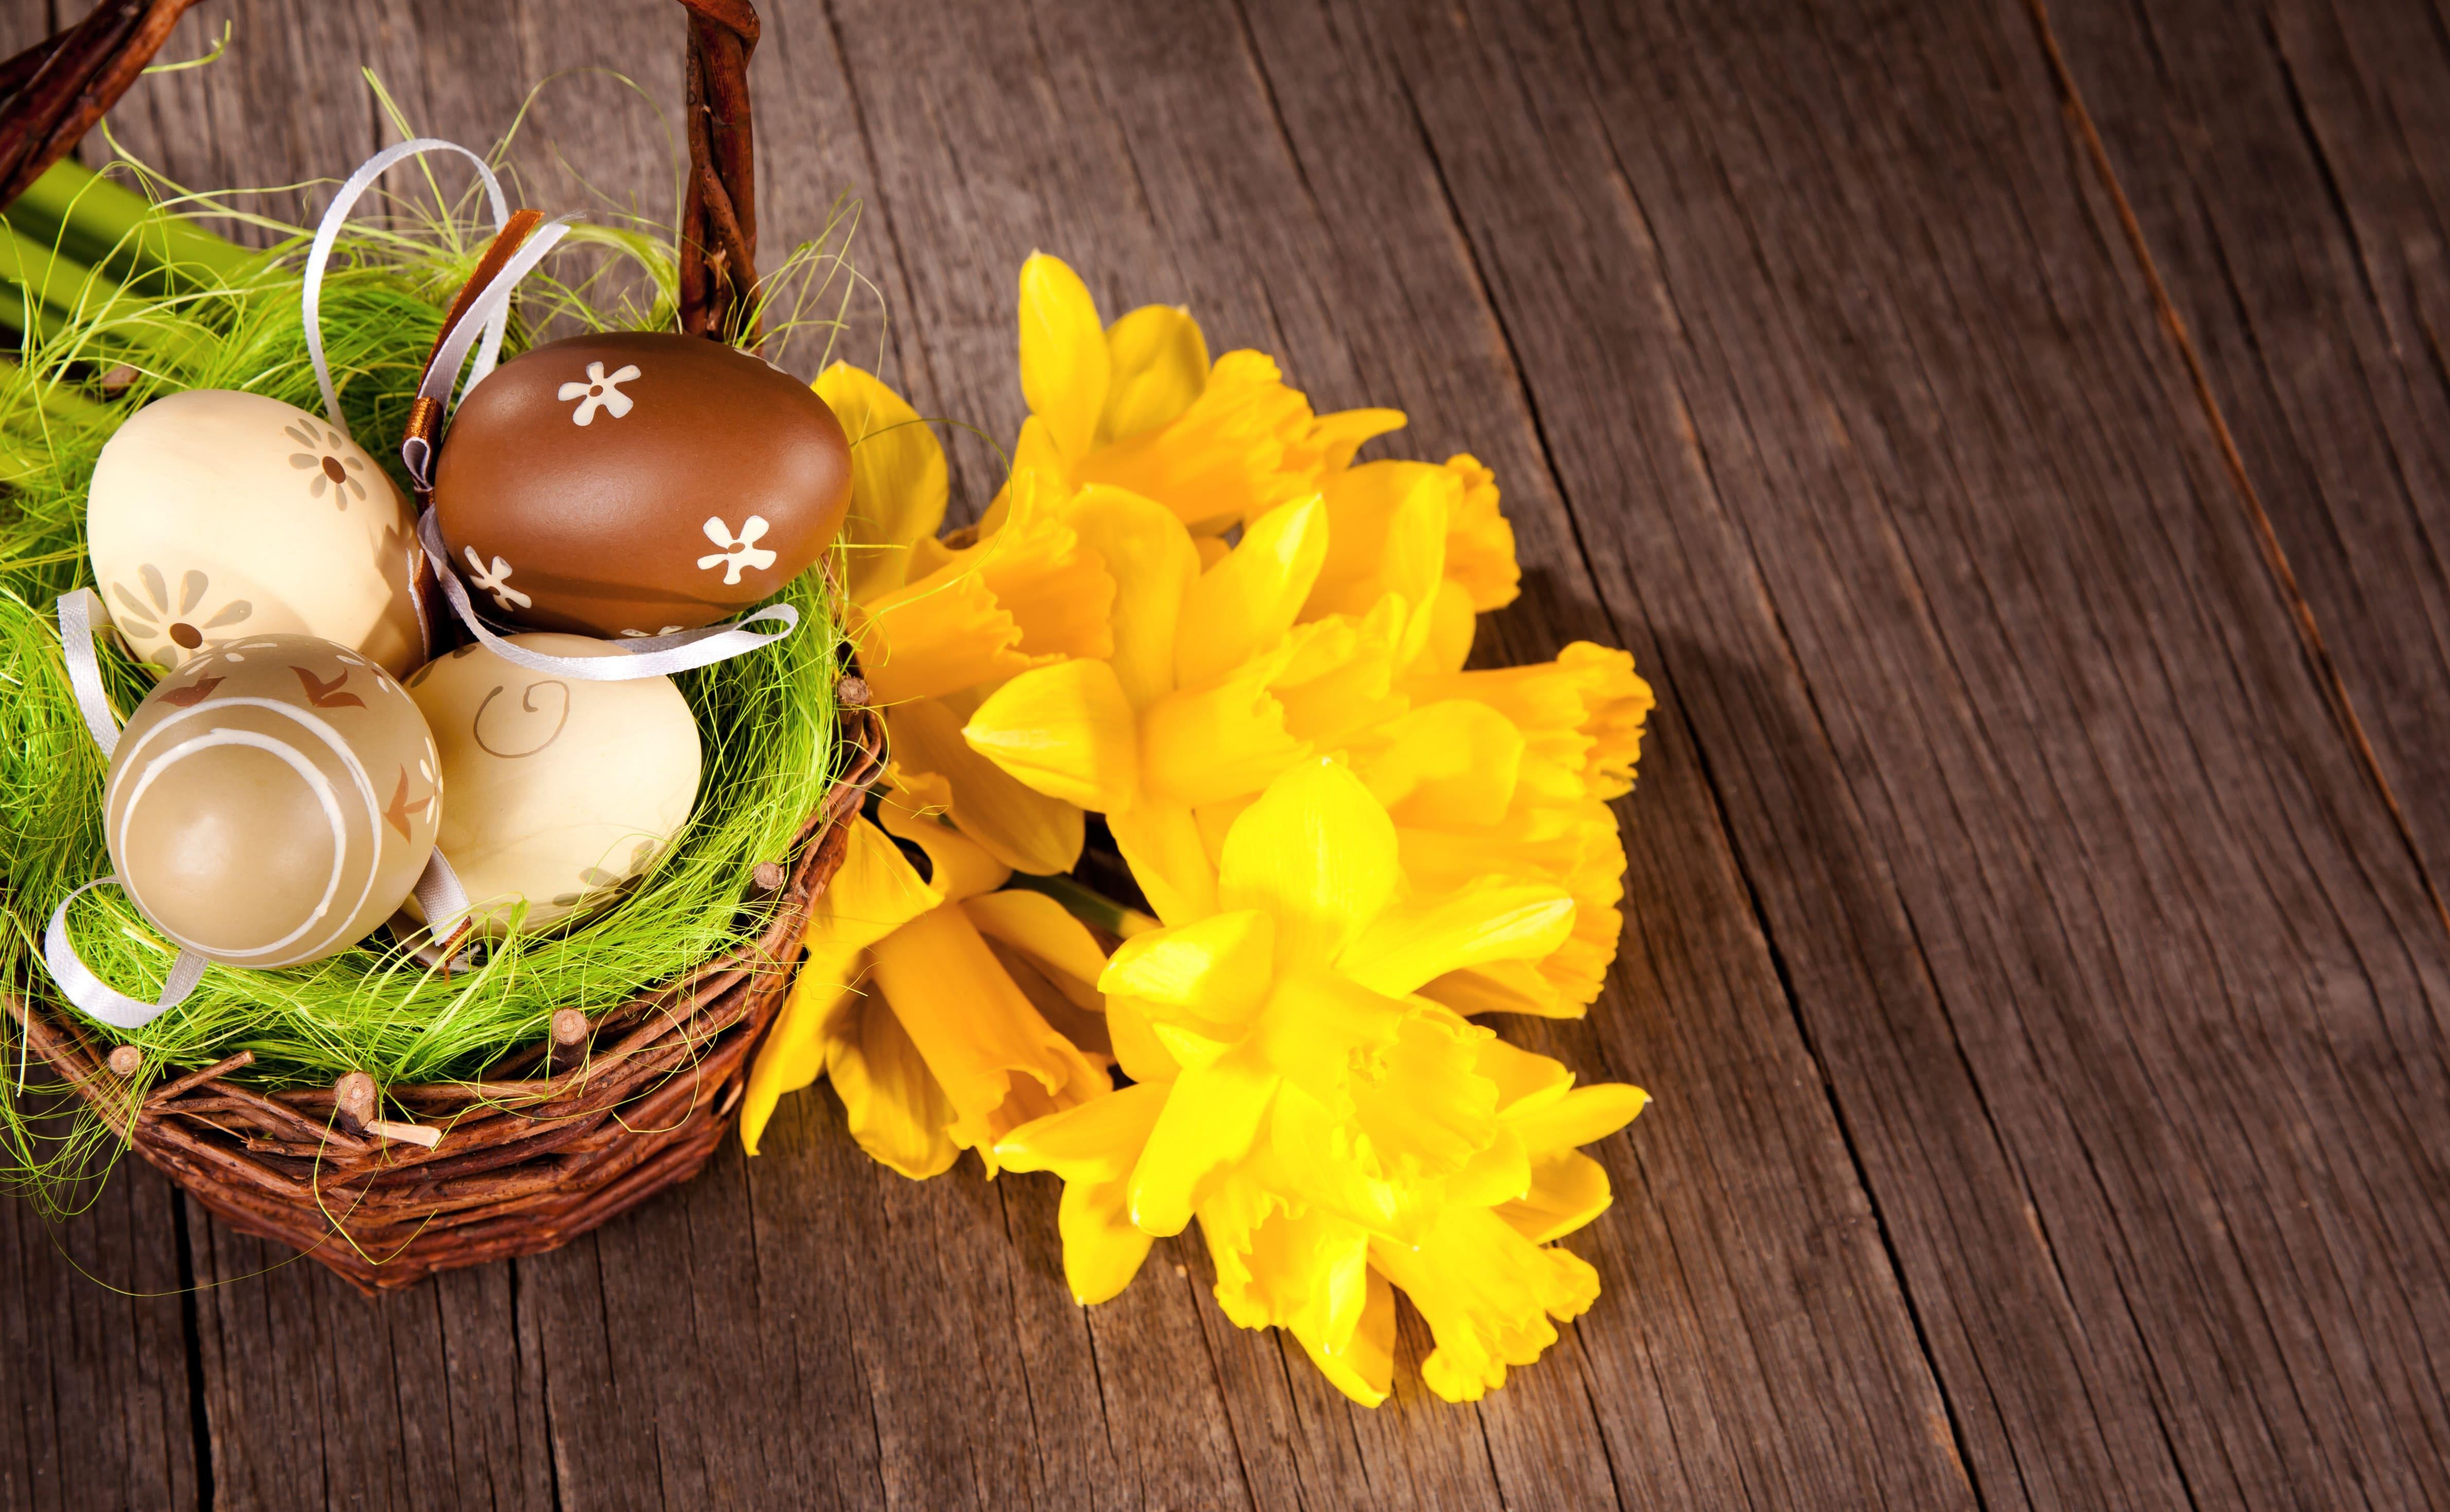 daffodils-photo-81